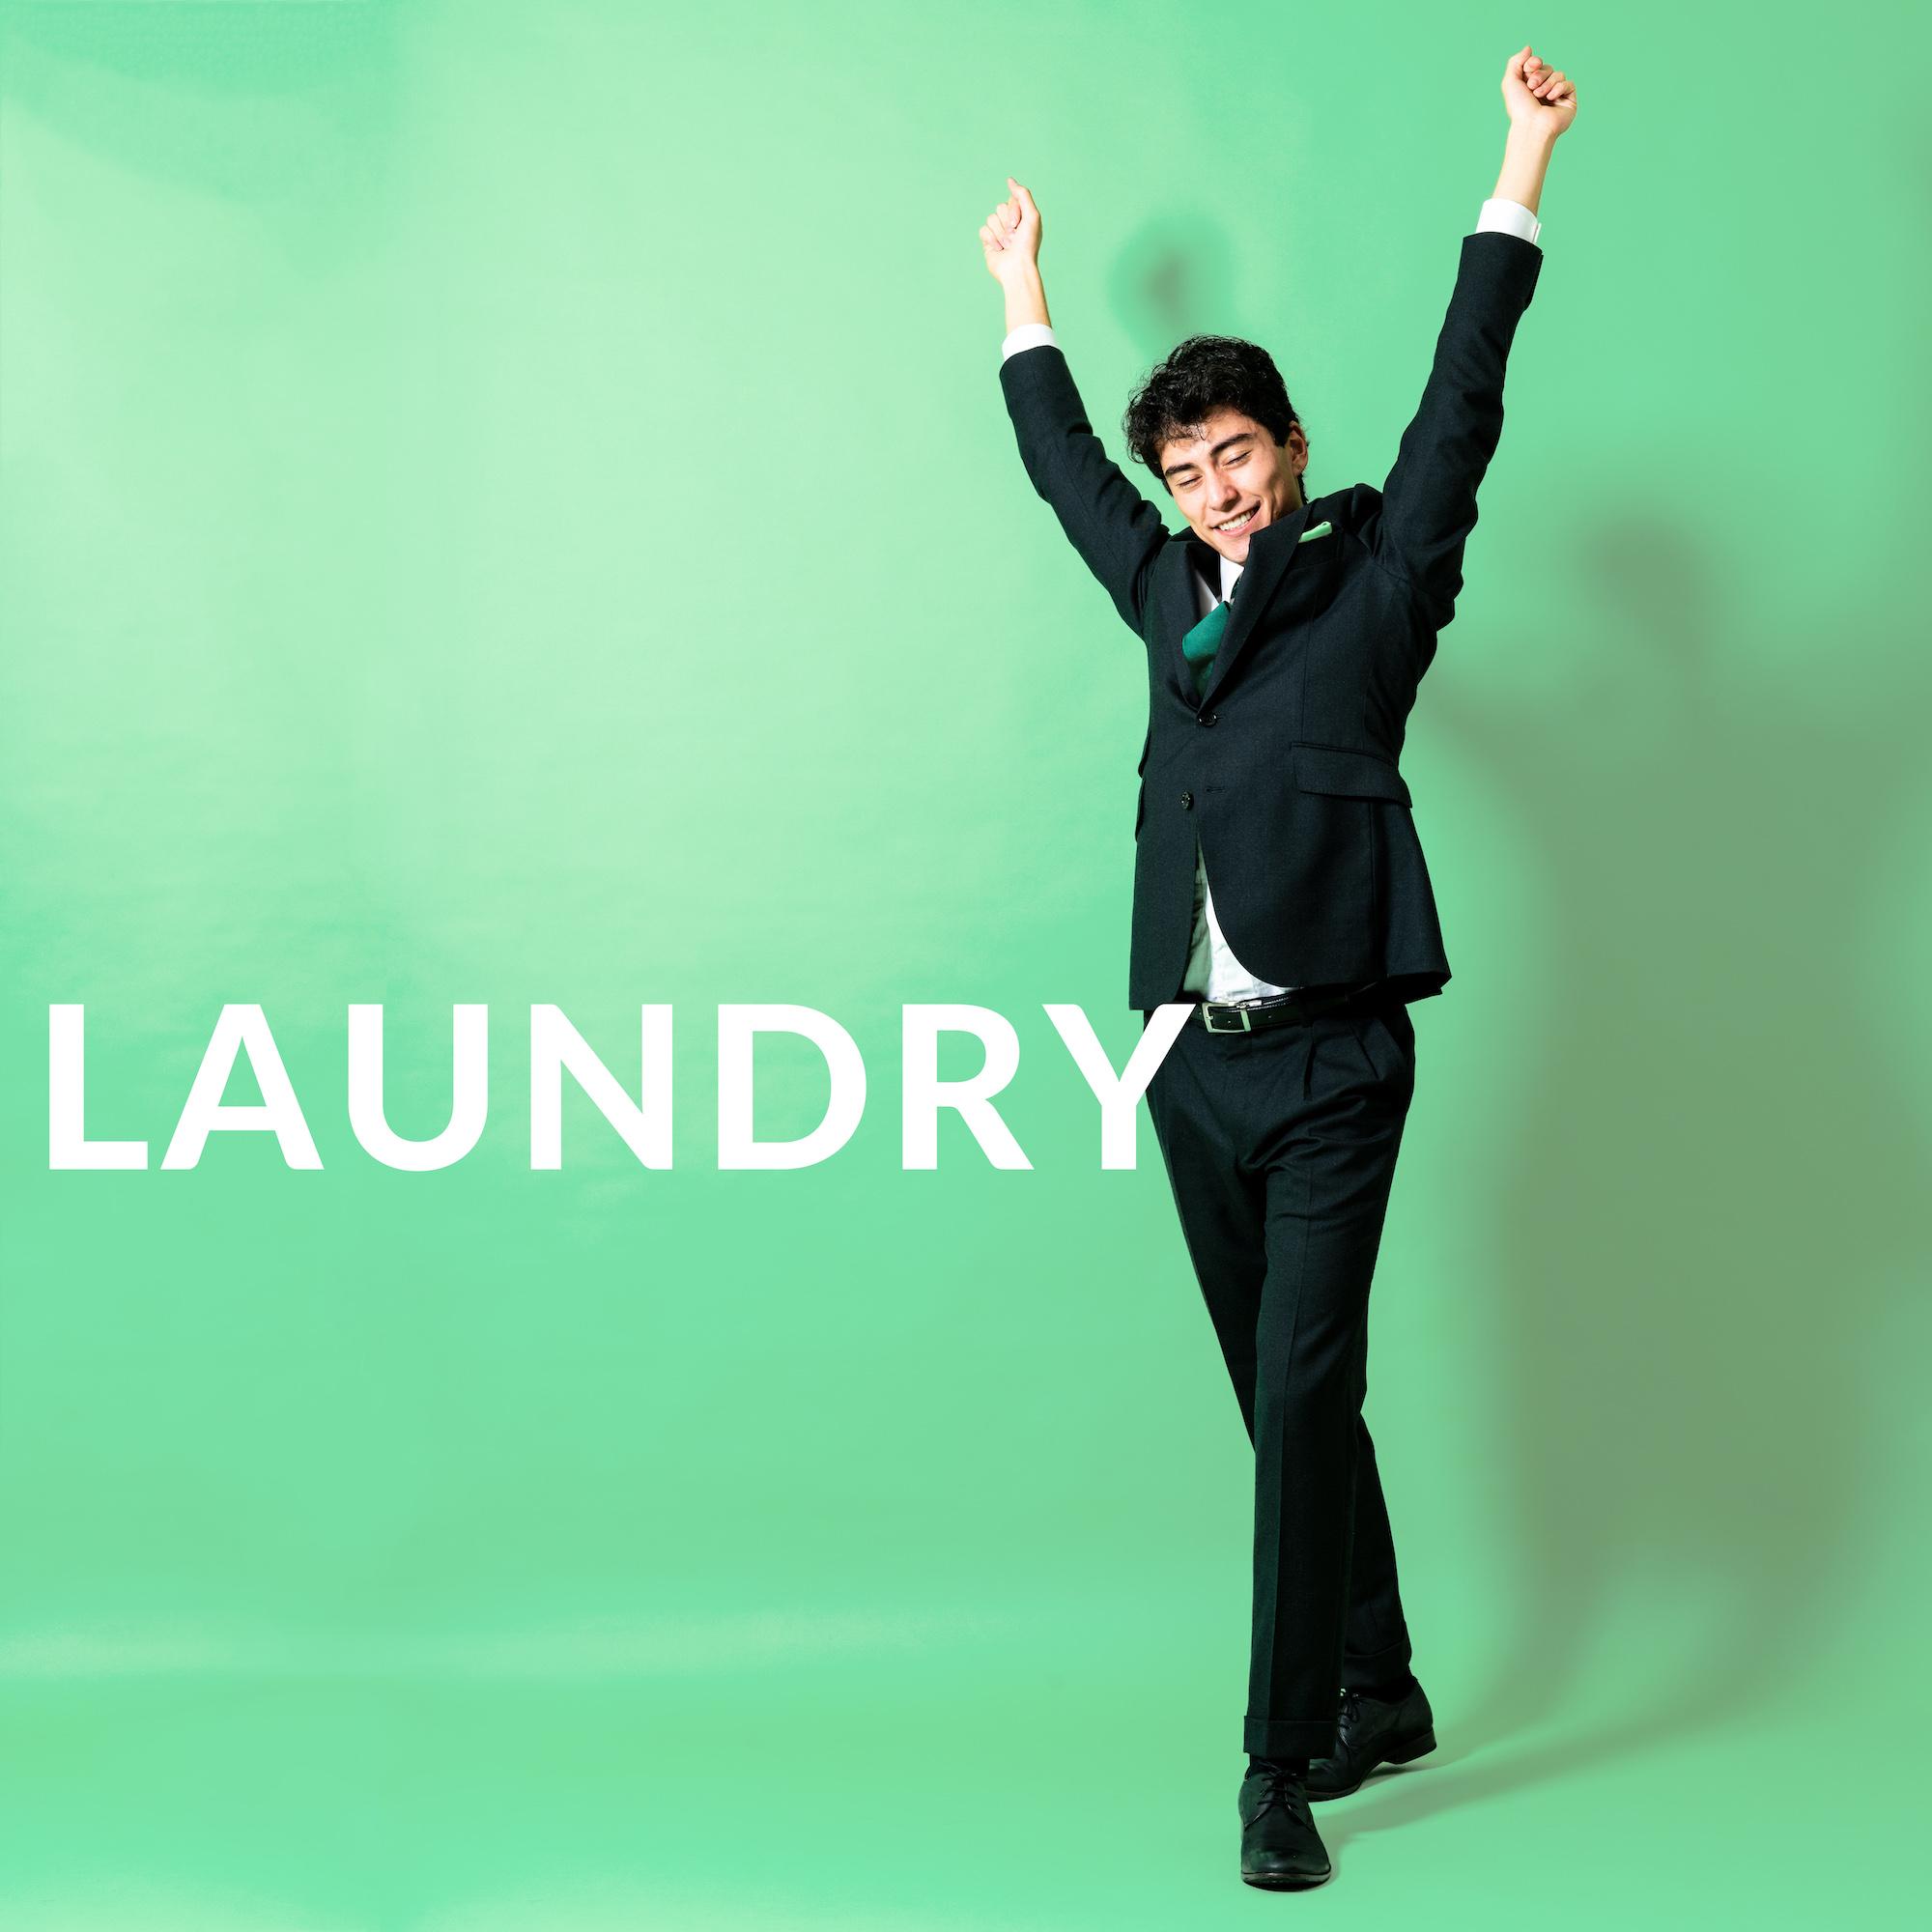 Laundry_20190119